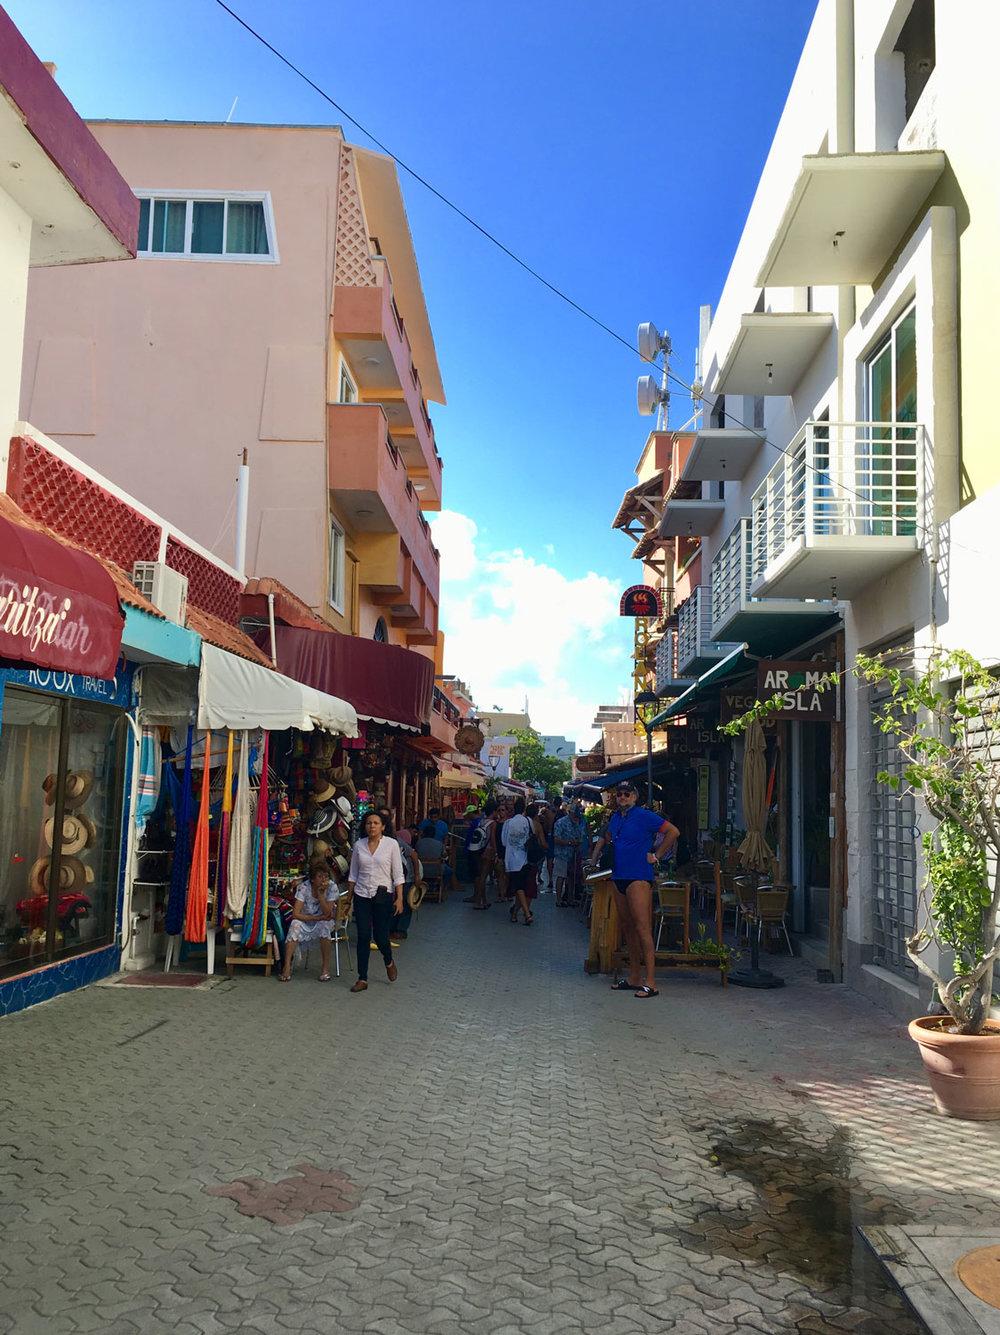 Hammocks_and_Ruins_Riviera_Maya_What_to_Do_Playa_Del_Carmen_Tulum_Islands_Isla_Mujeres_20.jpg